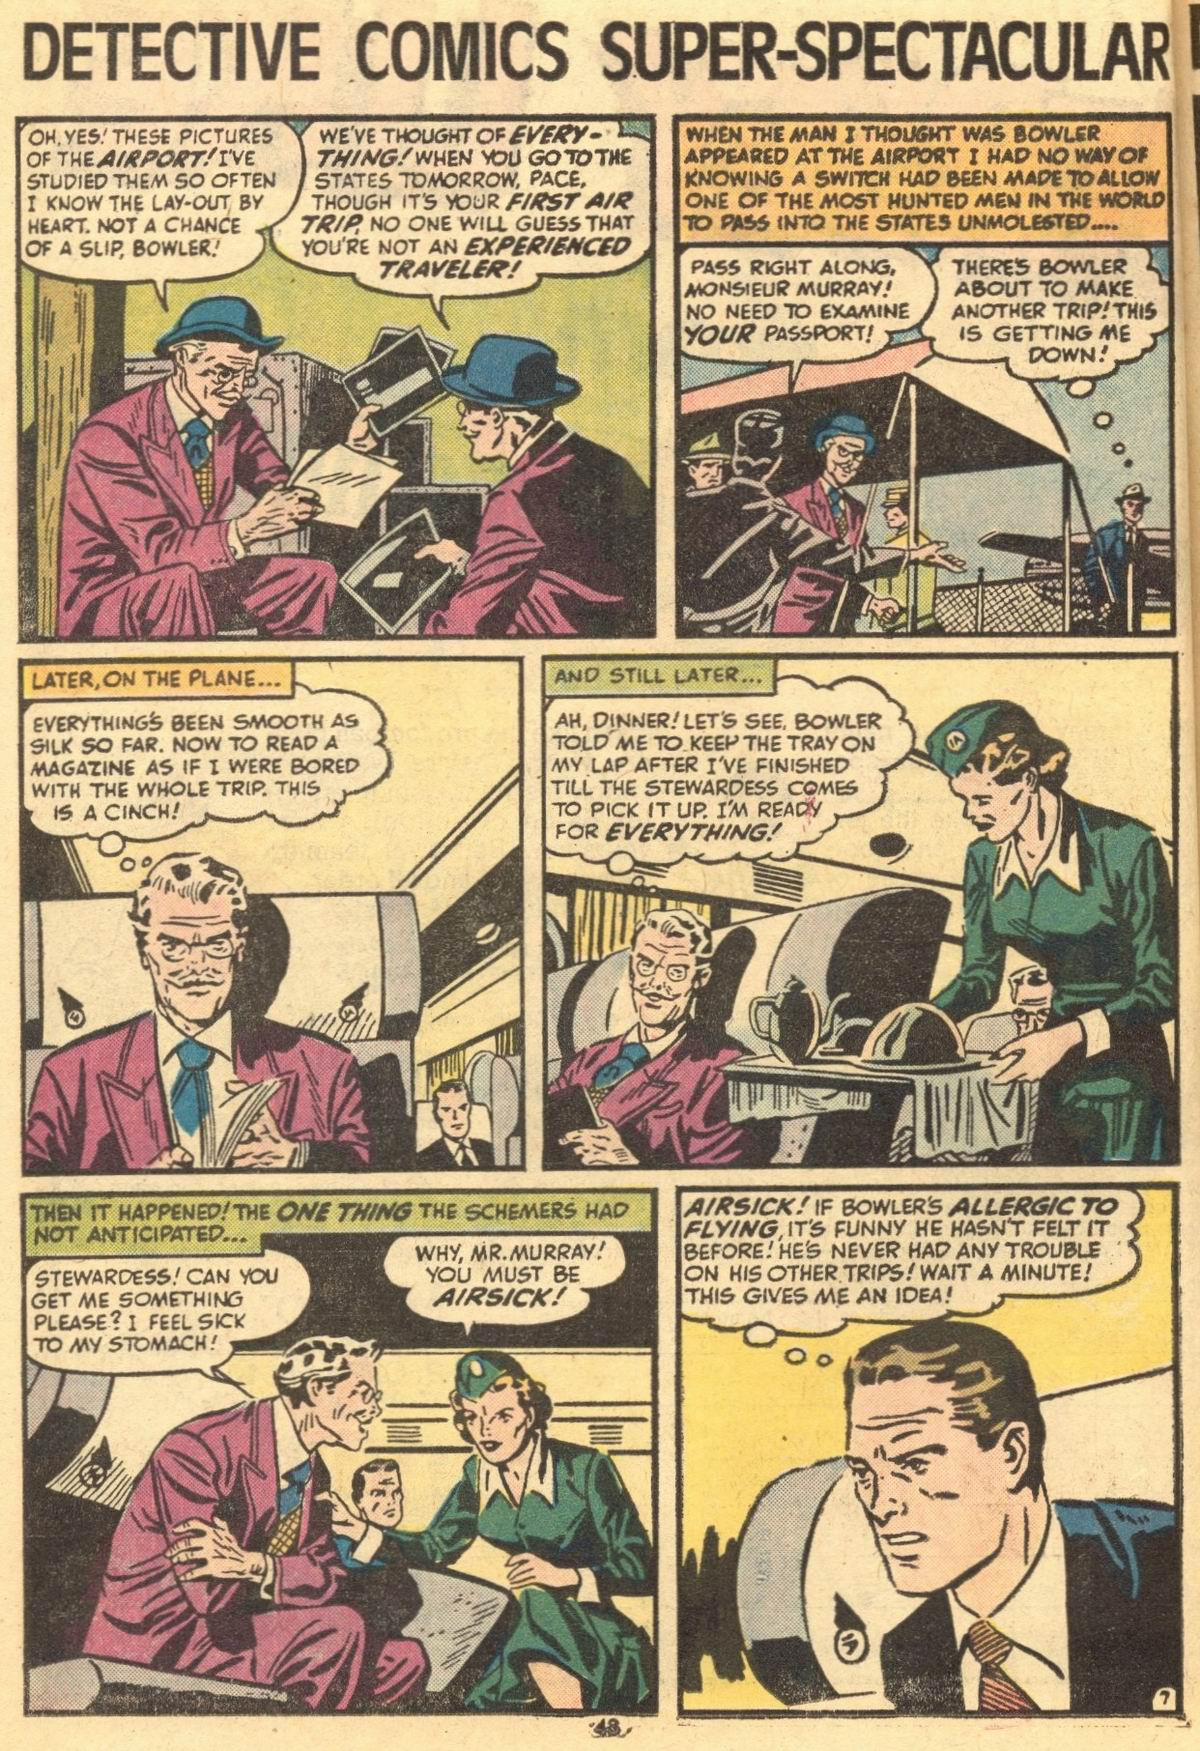 Detective Comics (1937) 444 Page 47